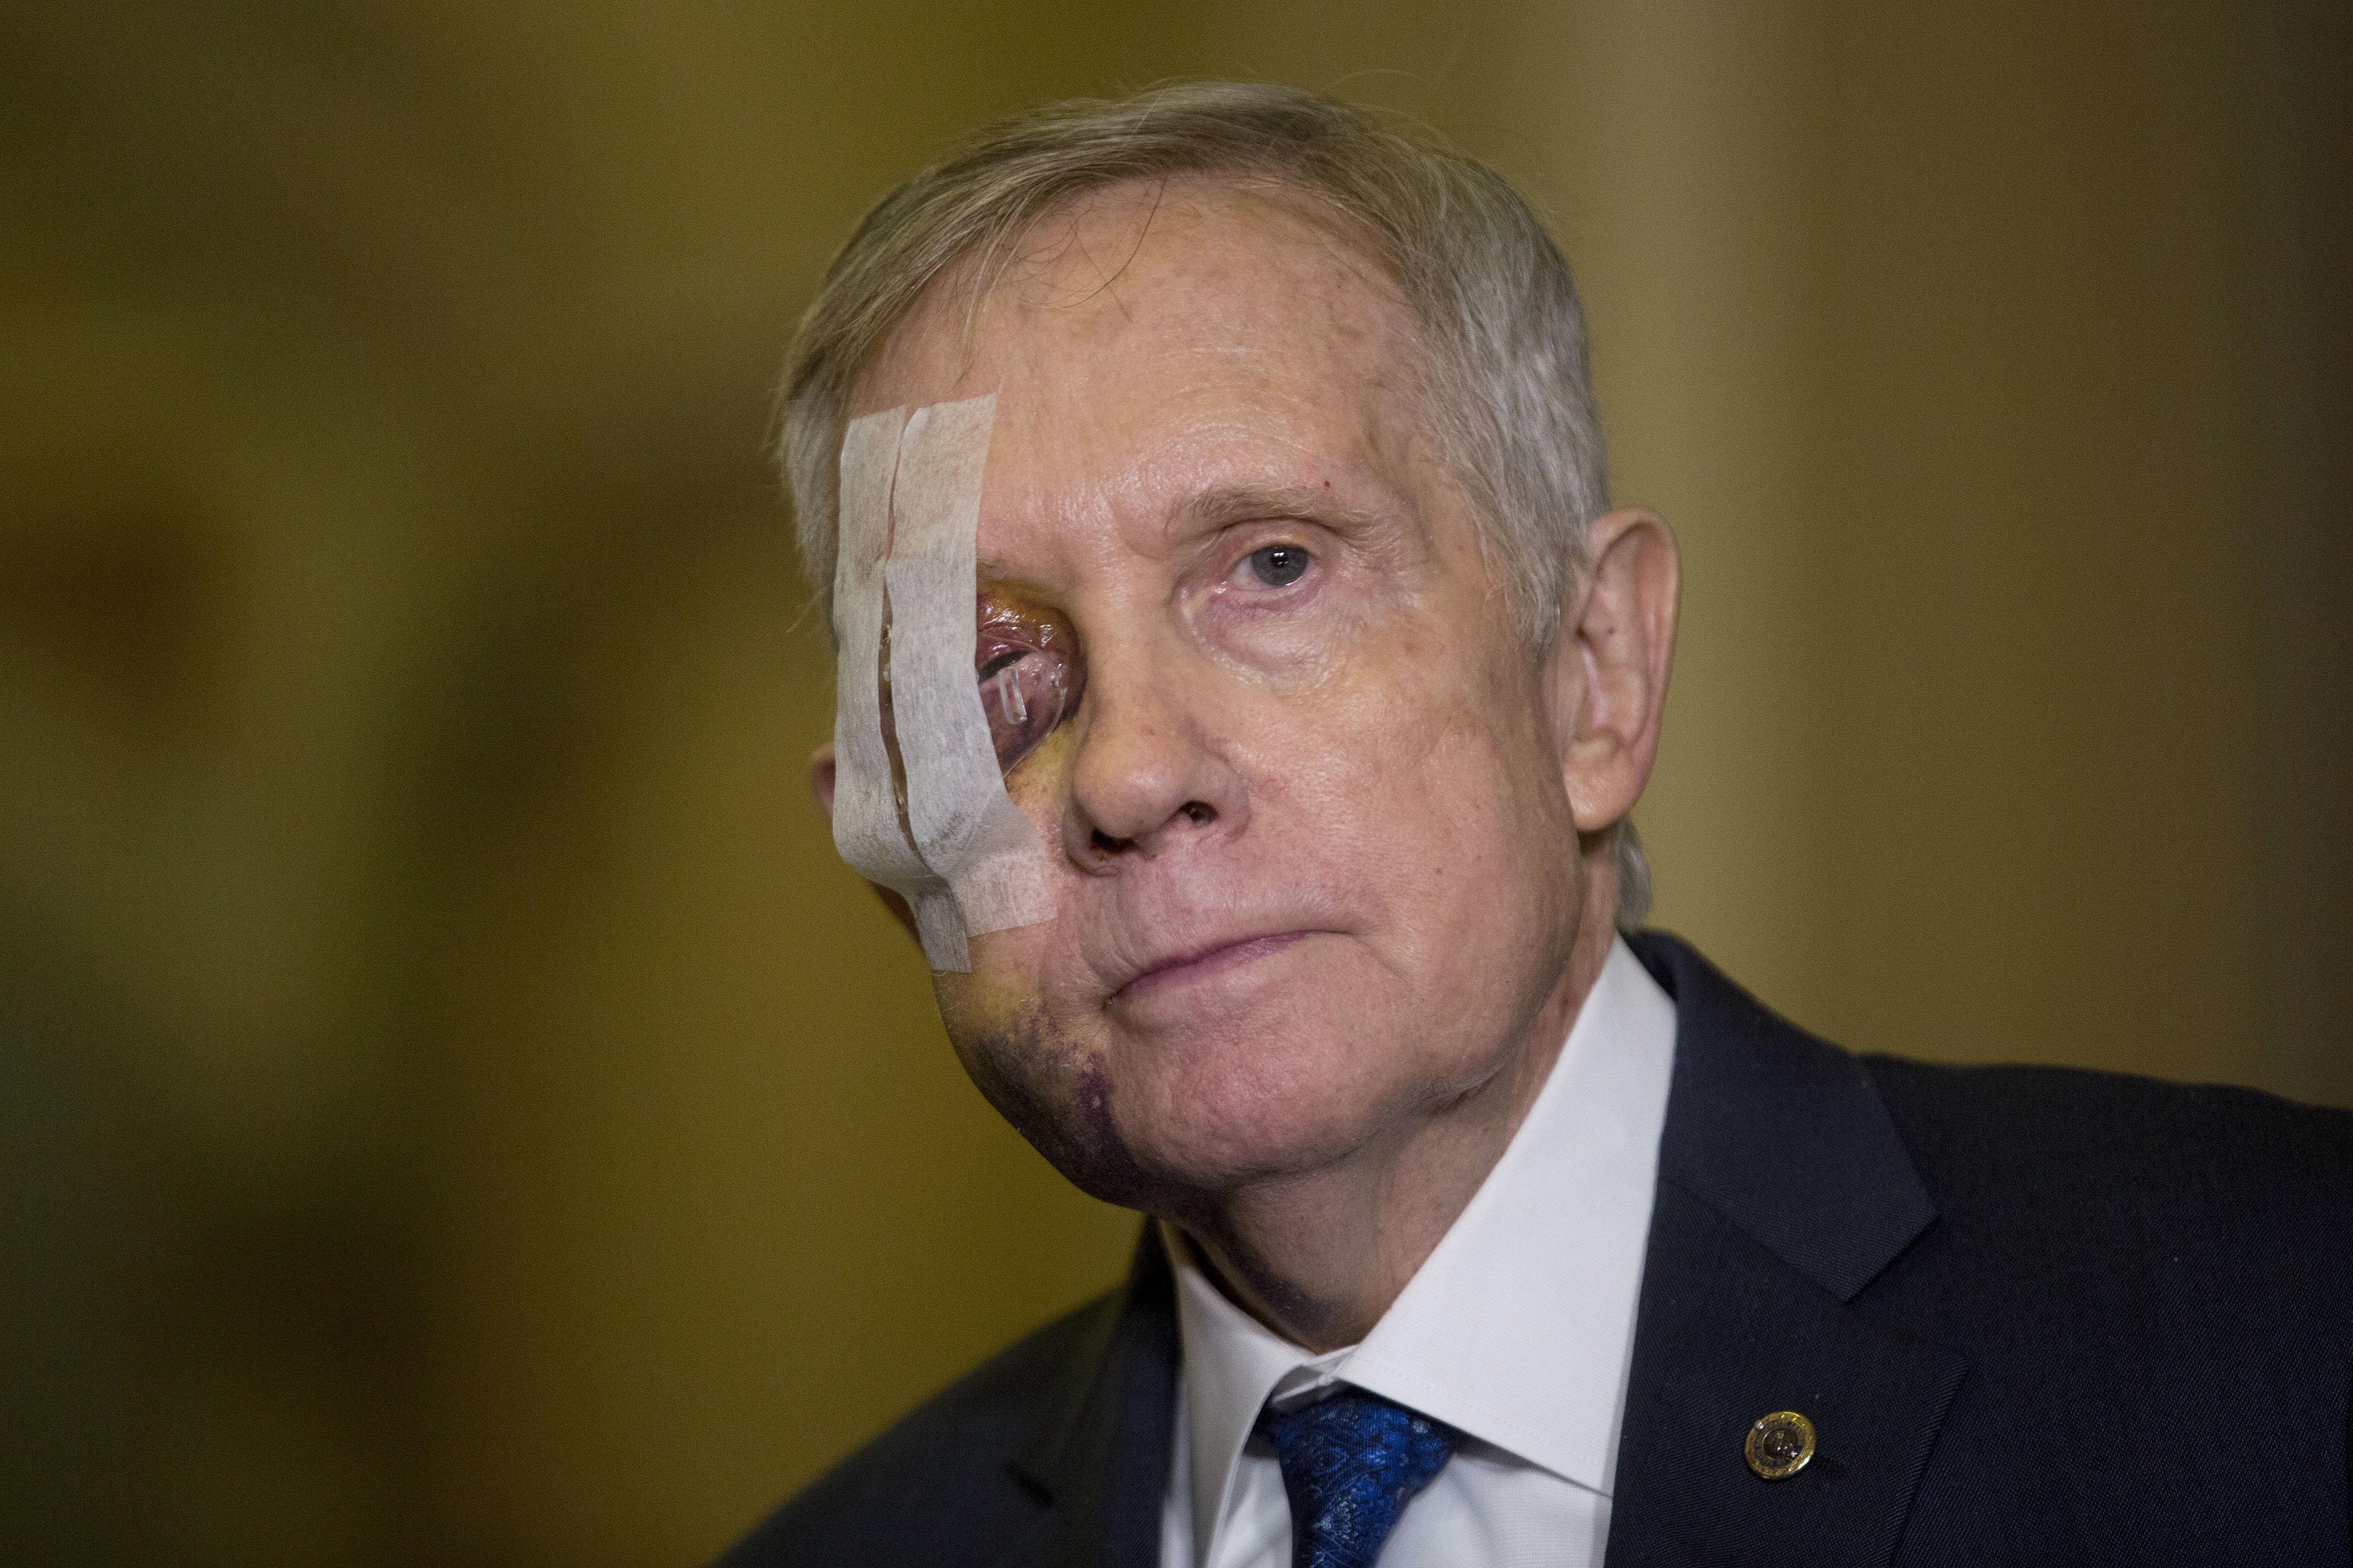 Senate Minority Leader Harry Reid (D-Nev.) injured his eye in an exercising accident.